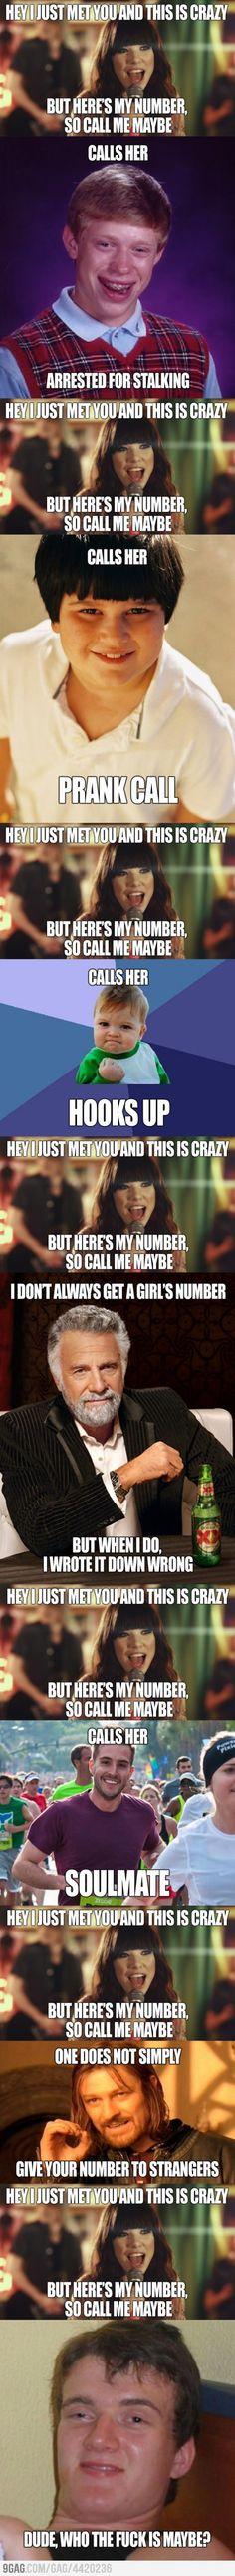 Call me maybe?